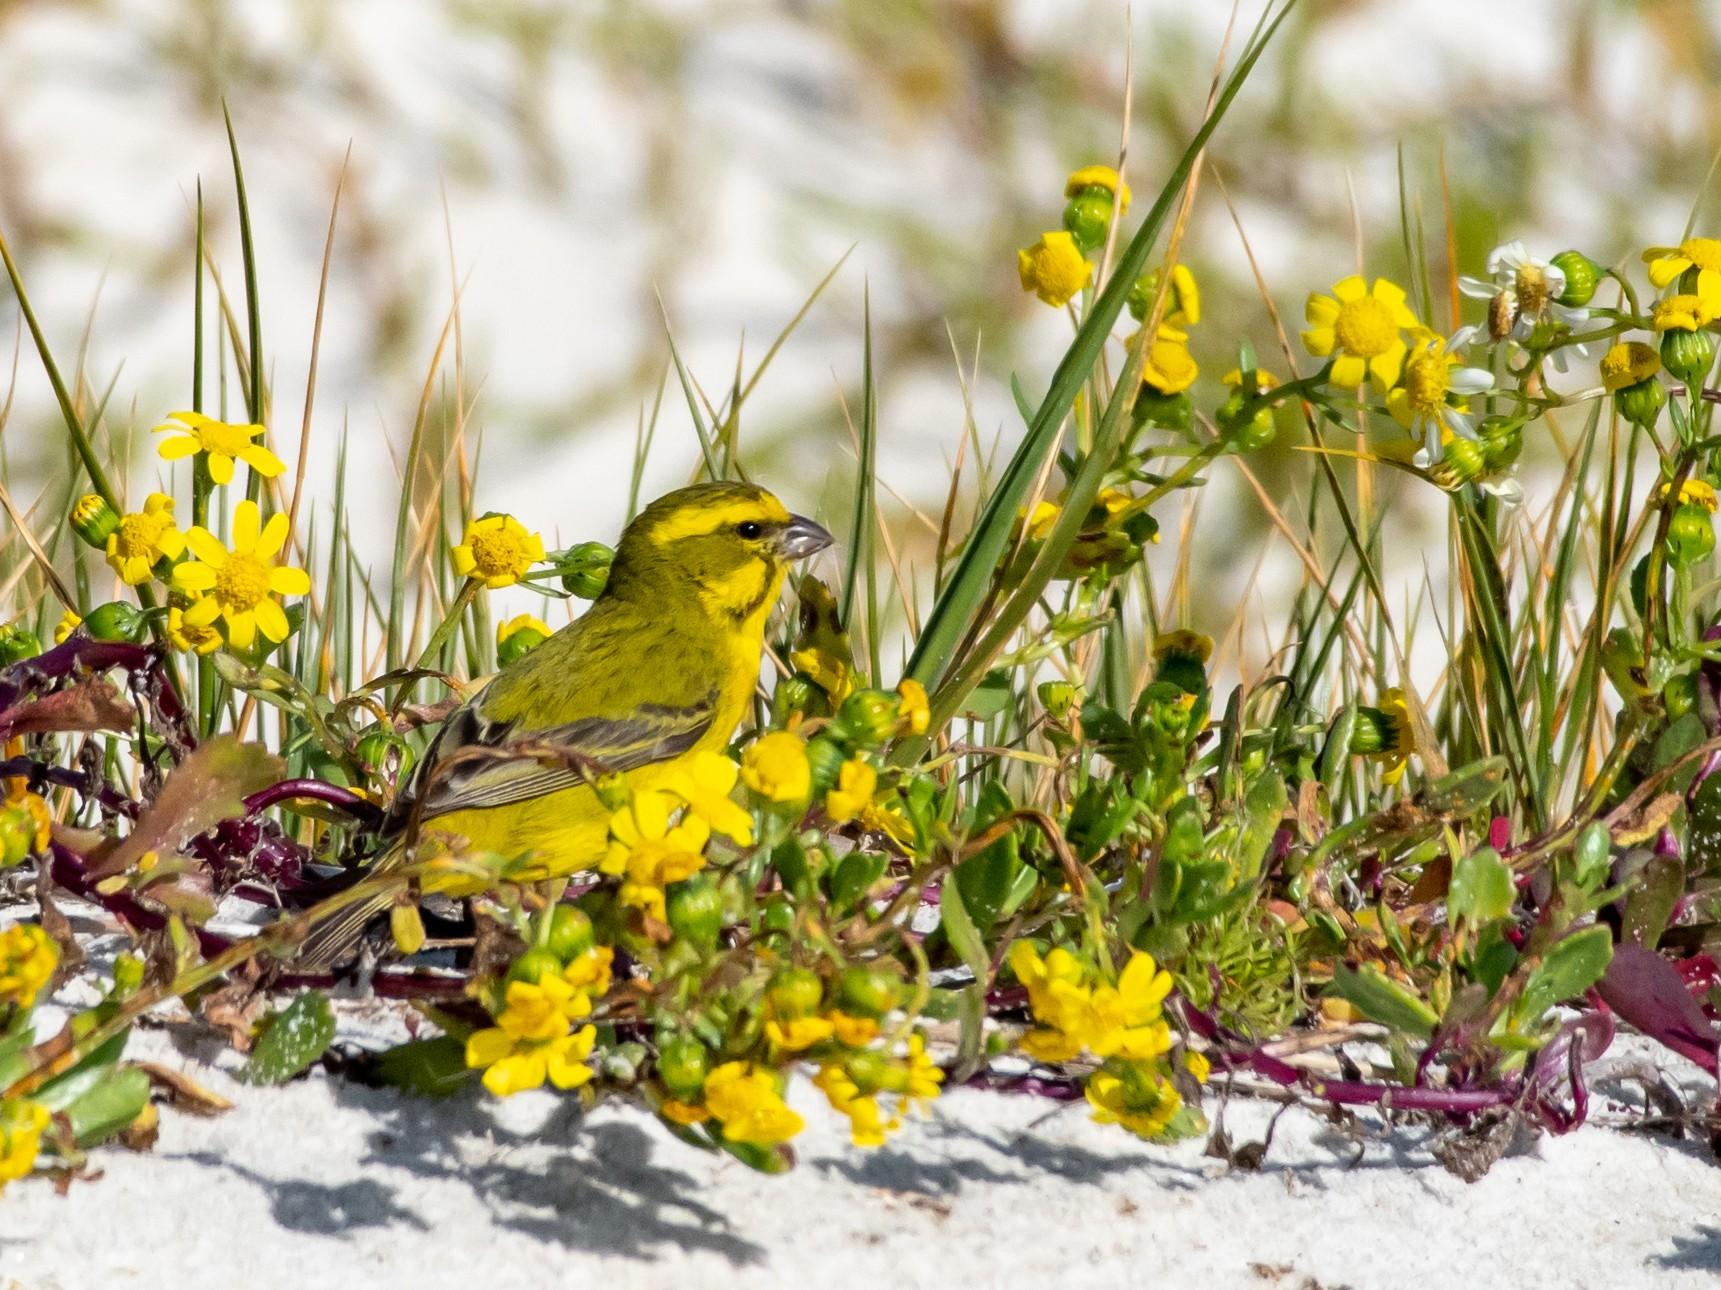 Yellow Canary - Hank Davis